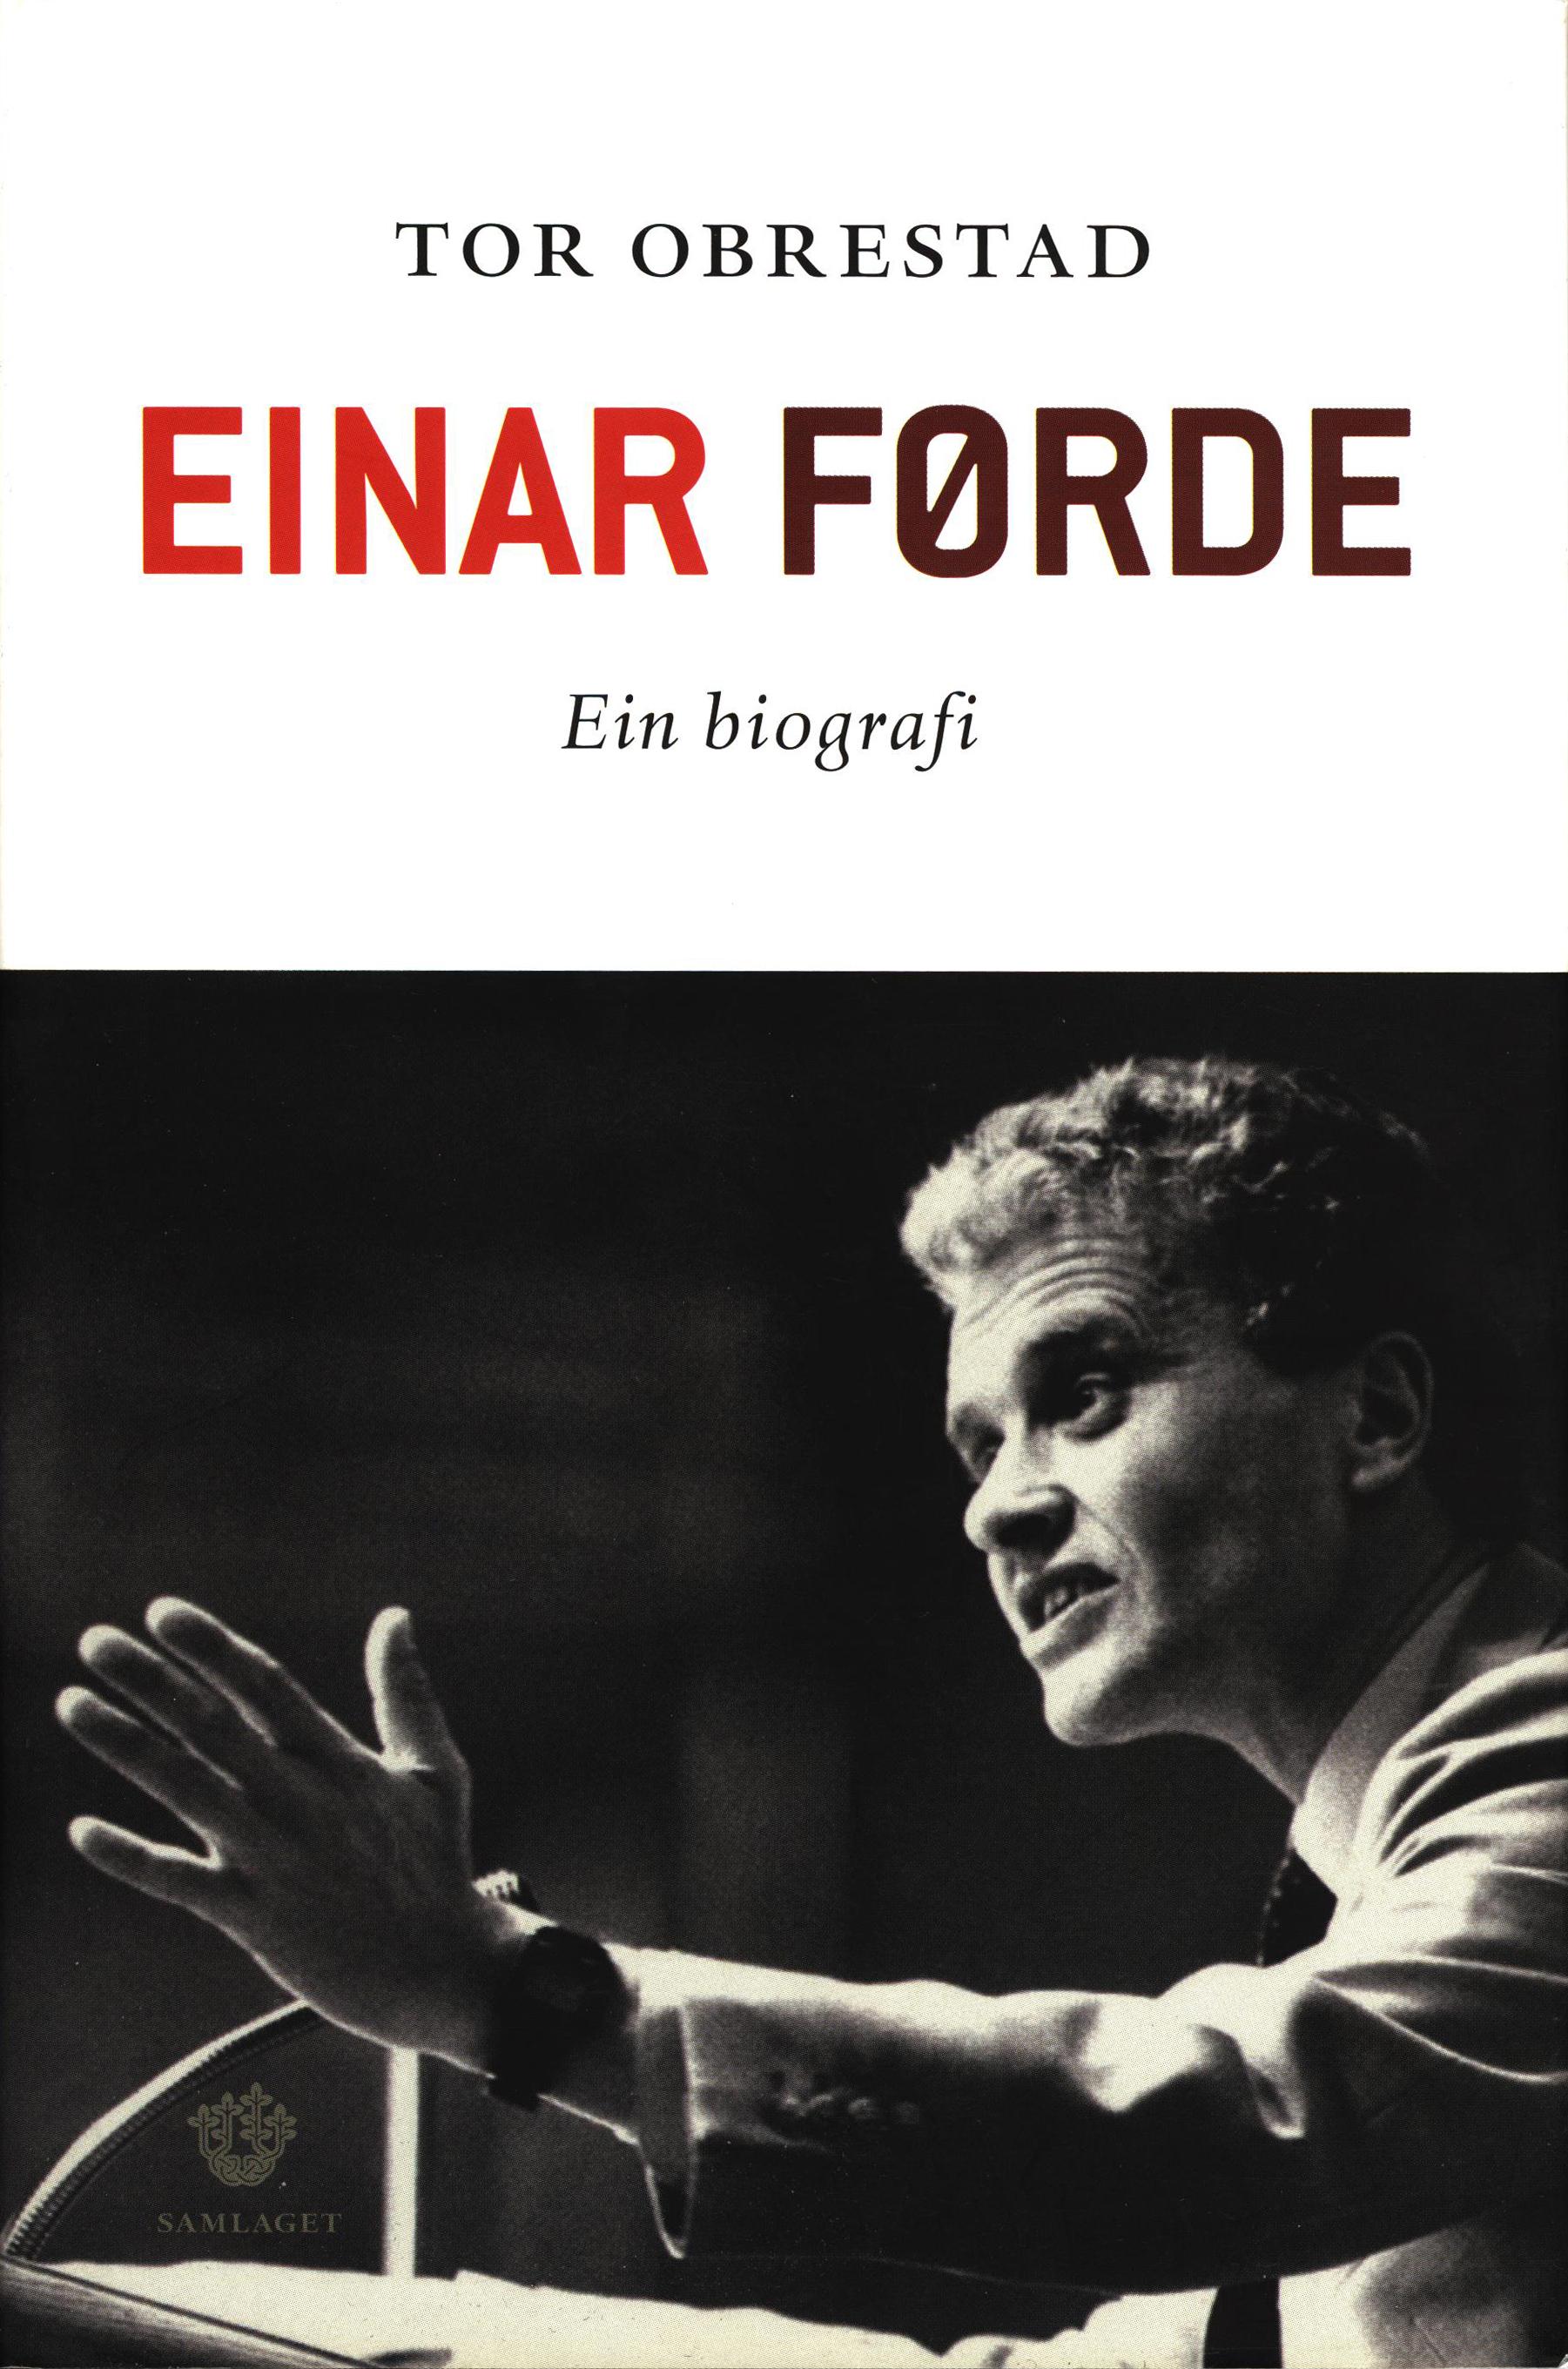 Tor Obrestad: Einar Førde - Ein biografi